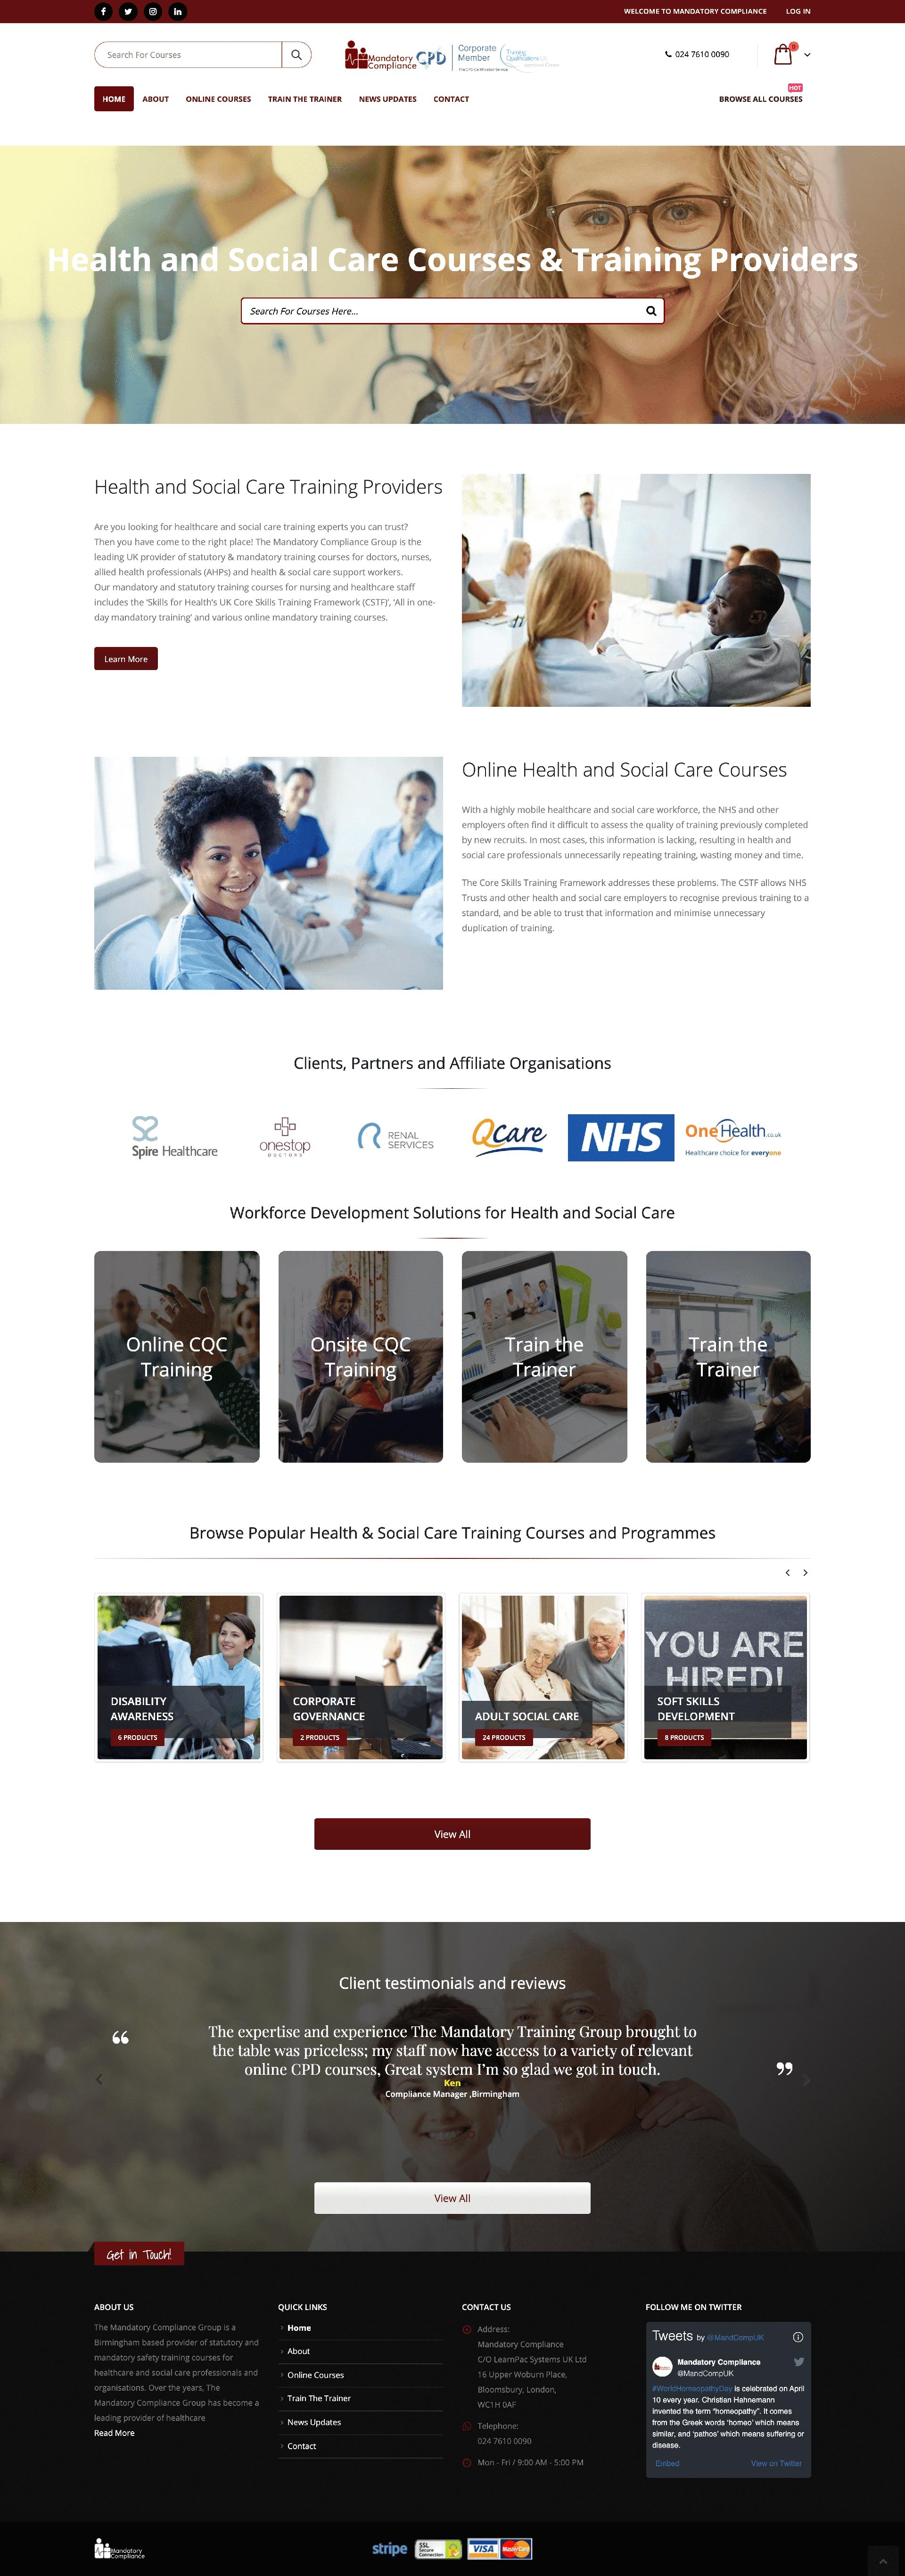 Website Design for Mandatory Training Courses Provider - Mandatory Compliance Mockup